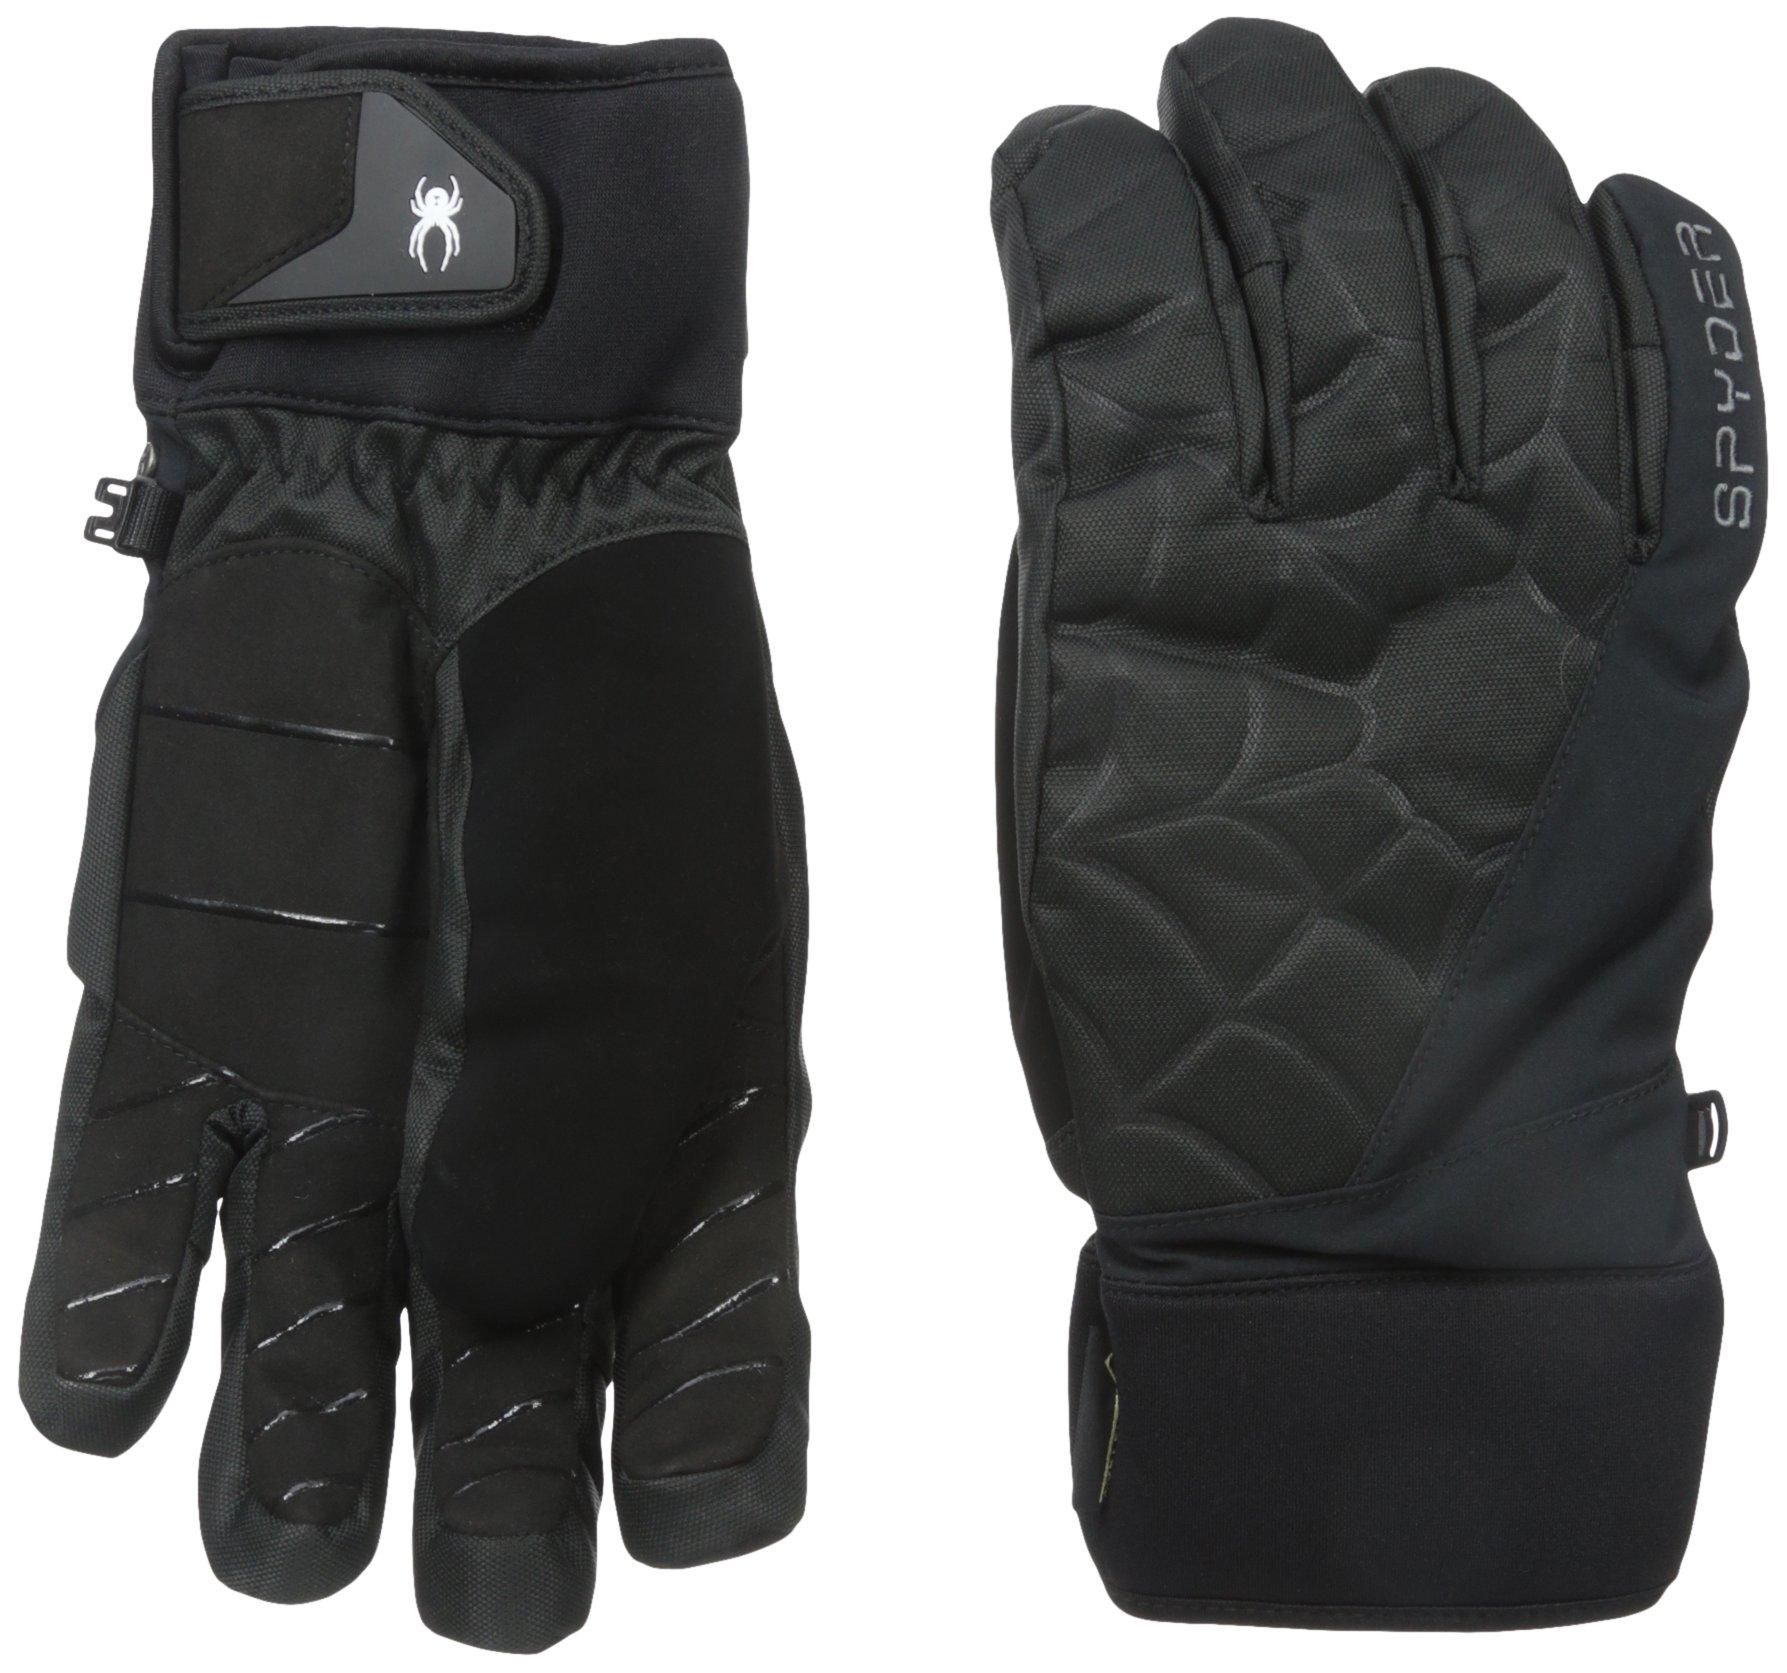 Spyder Men's Underweb Gore-Tex Glove, Black, Small